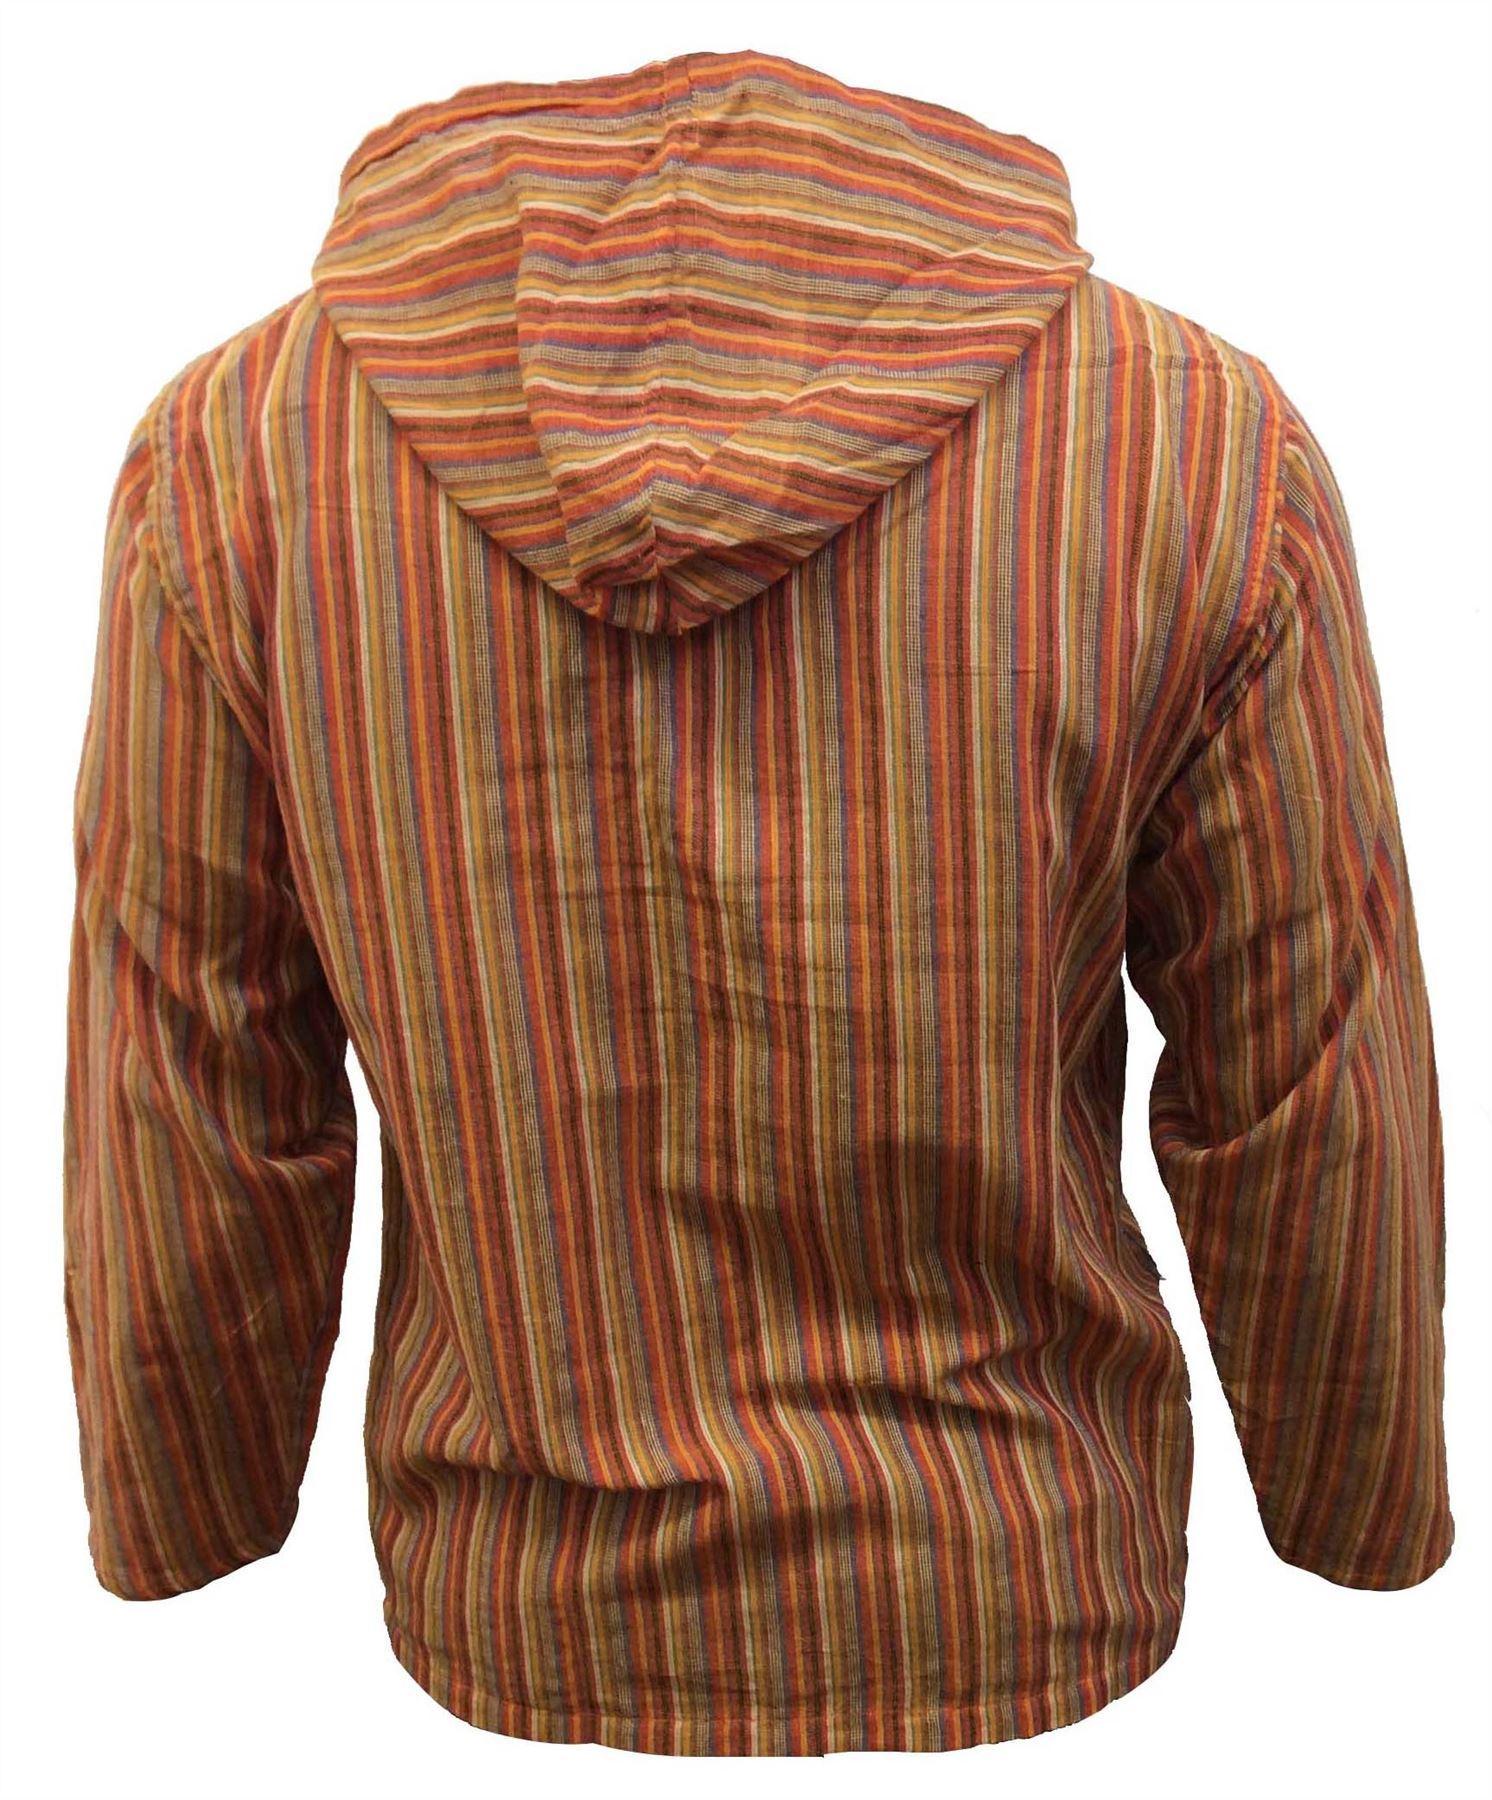 Men-039-s-Cotton-Grandad-Shirt-Full-Sleeved-Hippie-Top-Festival-Stripe-Hippy-Hoodie thumbnail 24